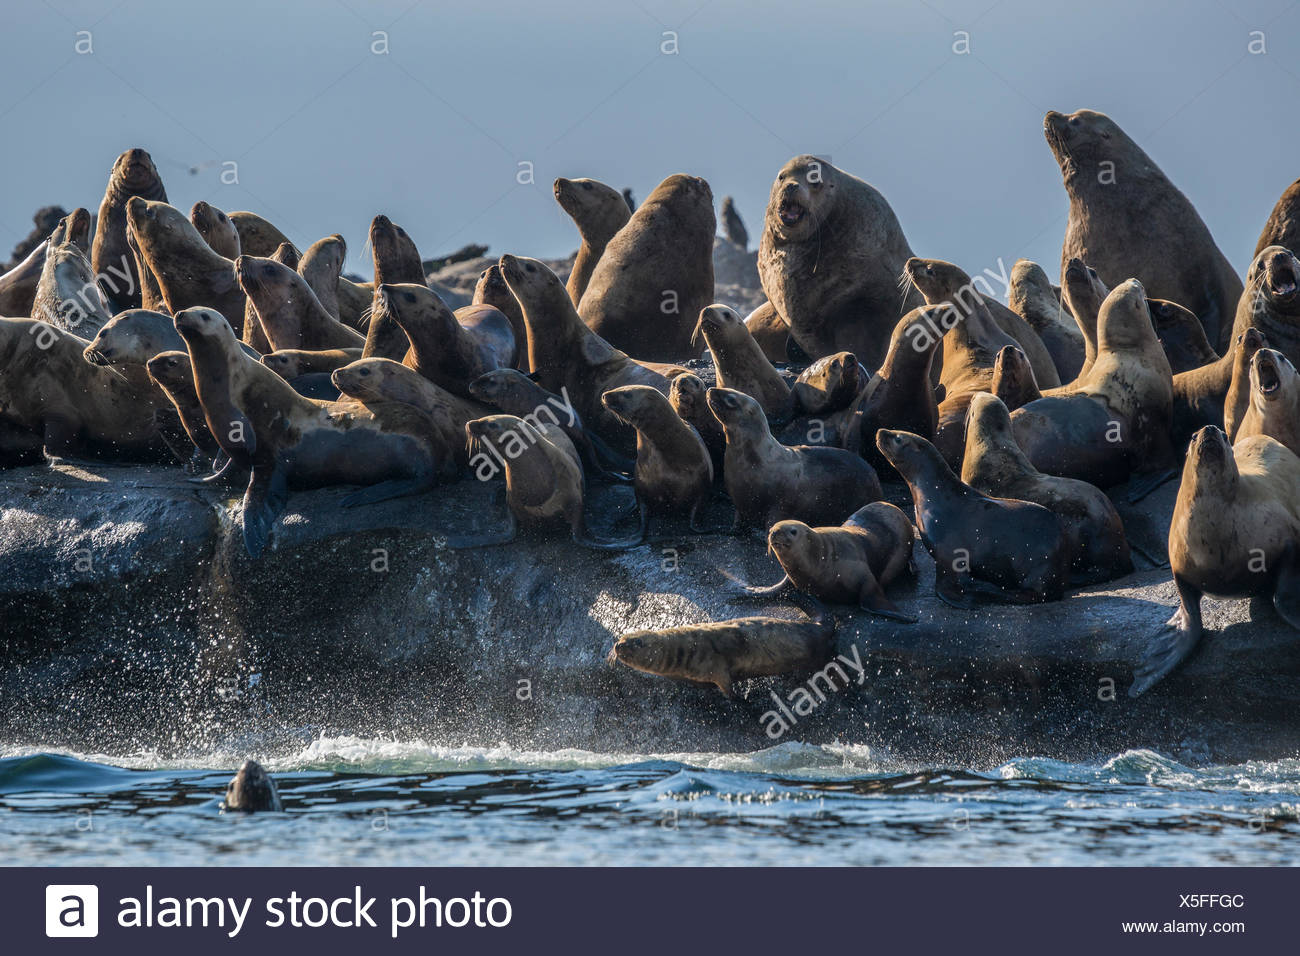 Stellar sea lions rest on Norris Rock. - Stock Image